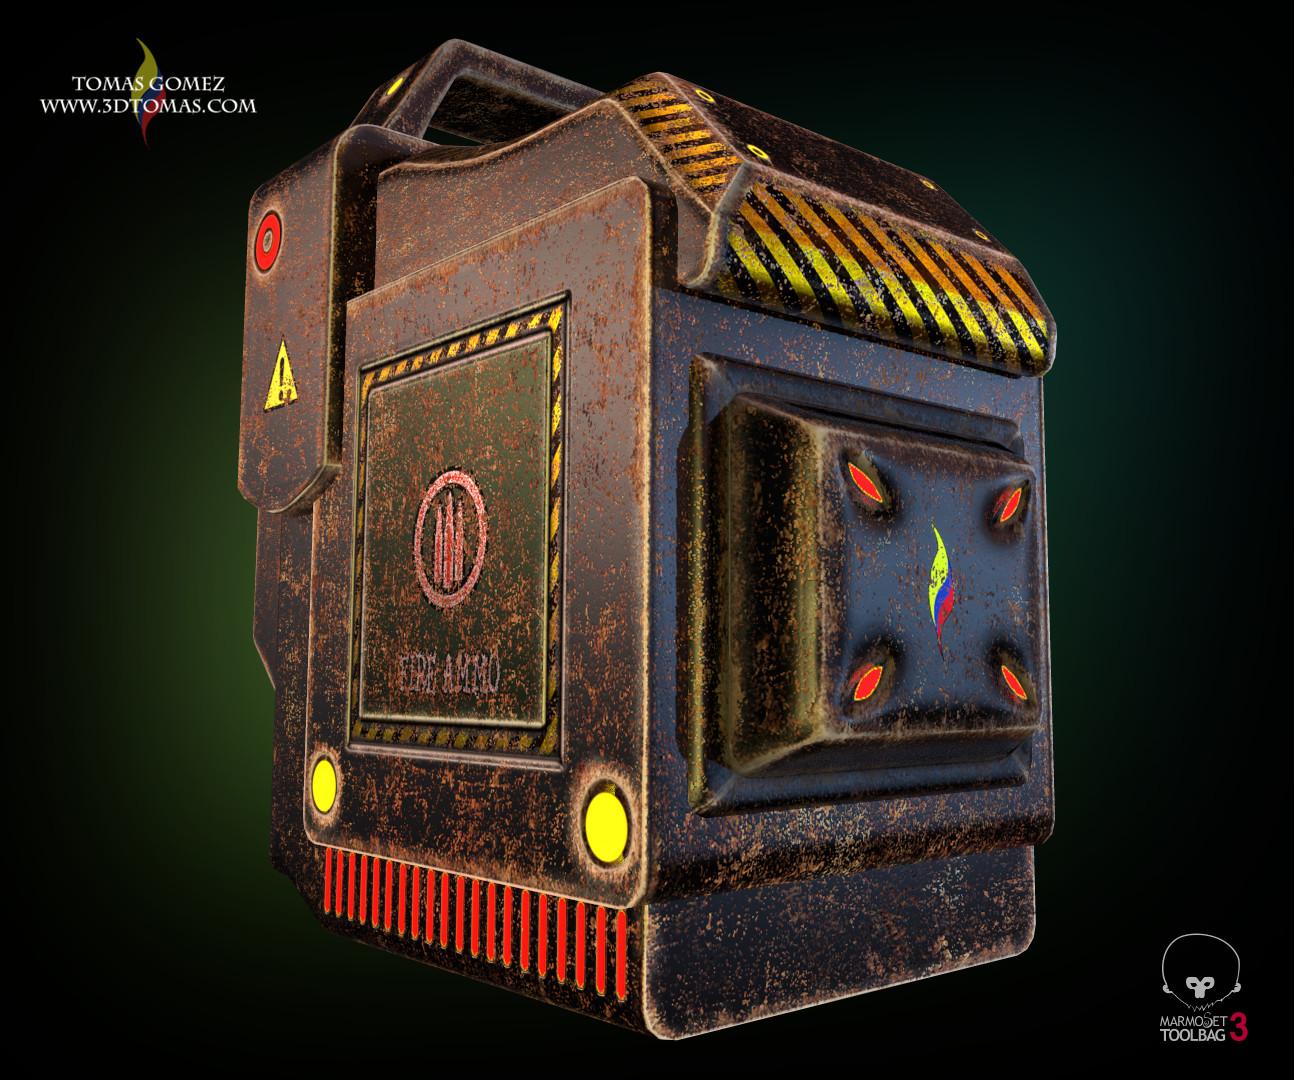 Tomas gomez crate3